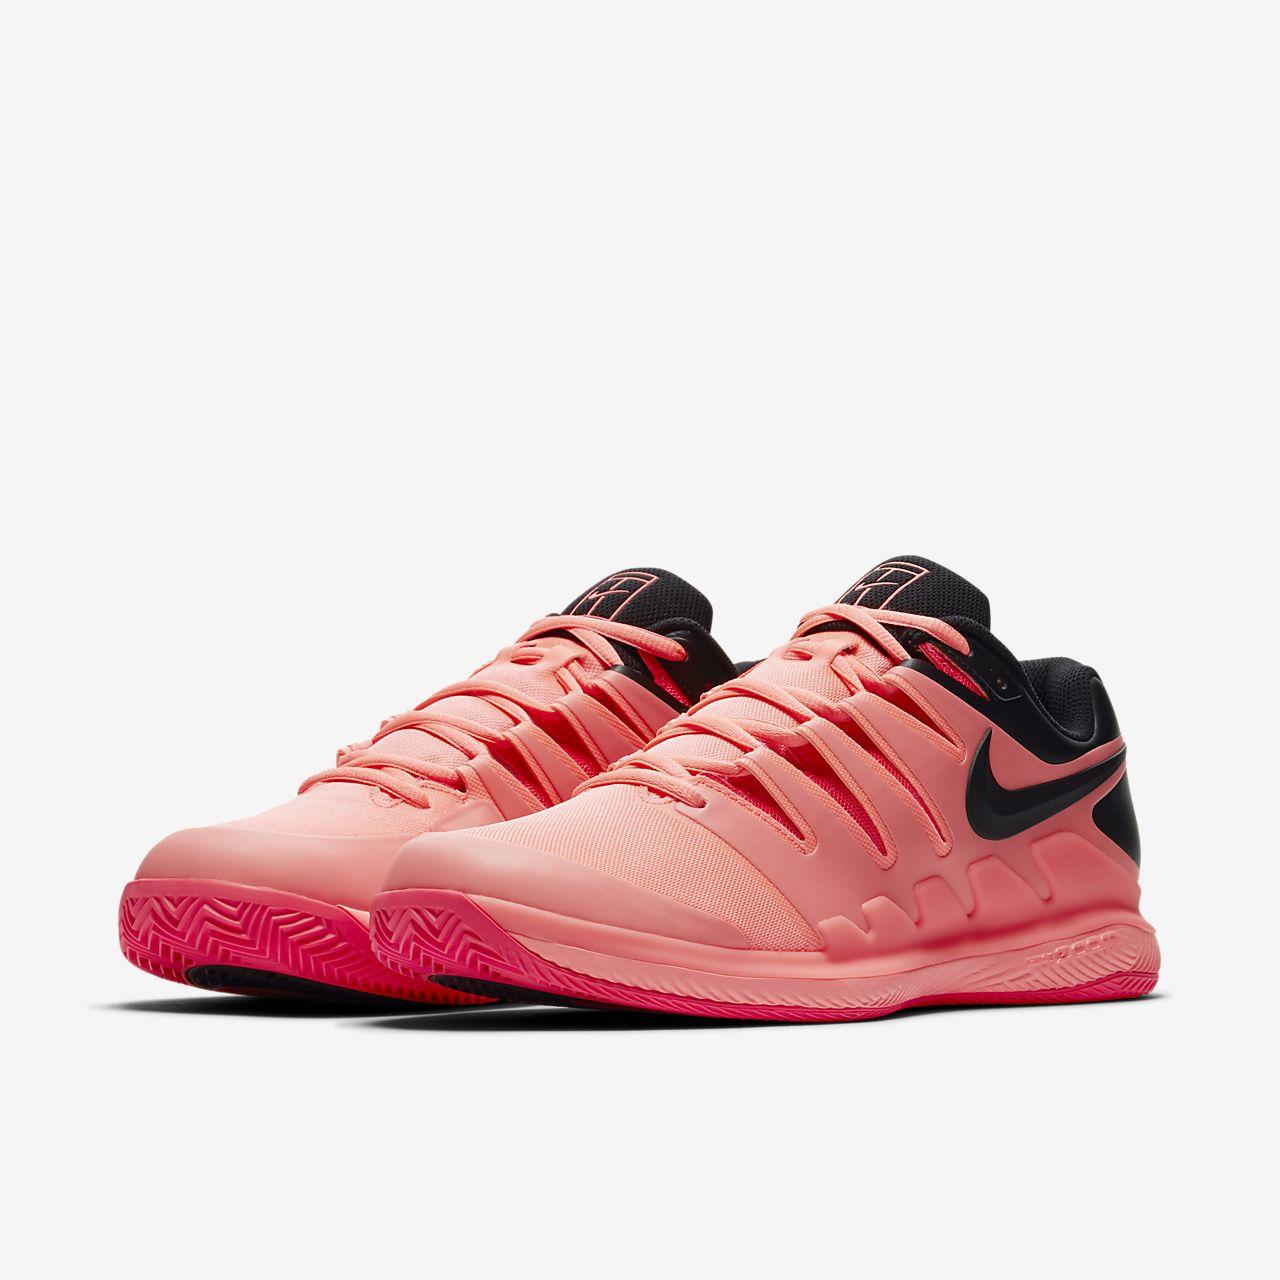 da8098dbabf79 Nike Air Zoom Vapor X Clay - Fluo Pink